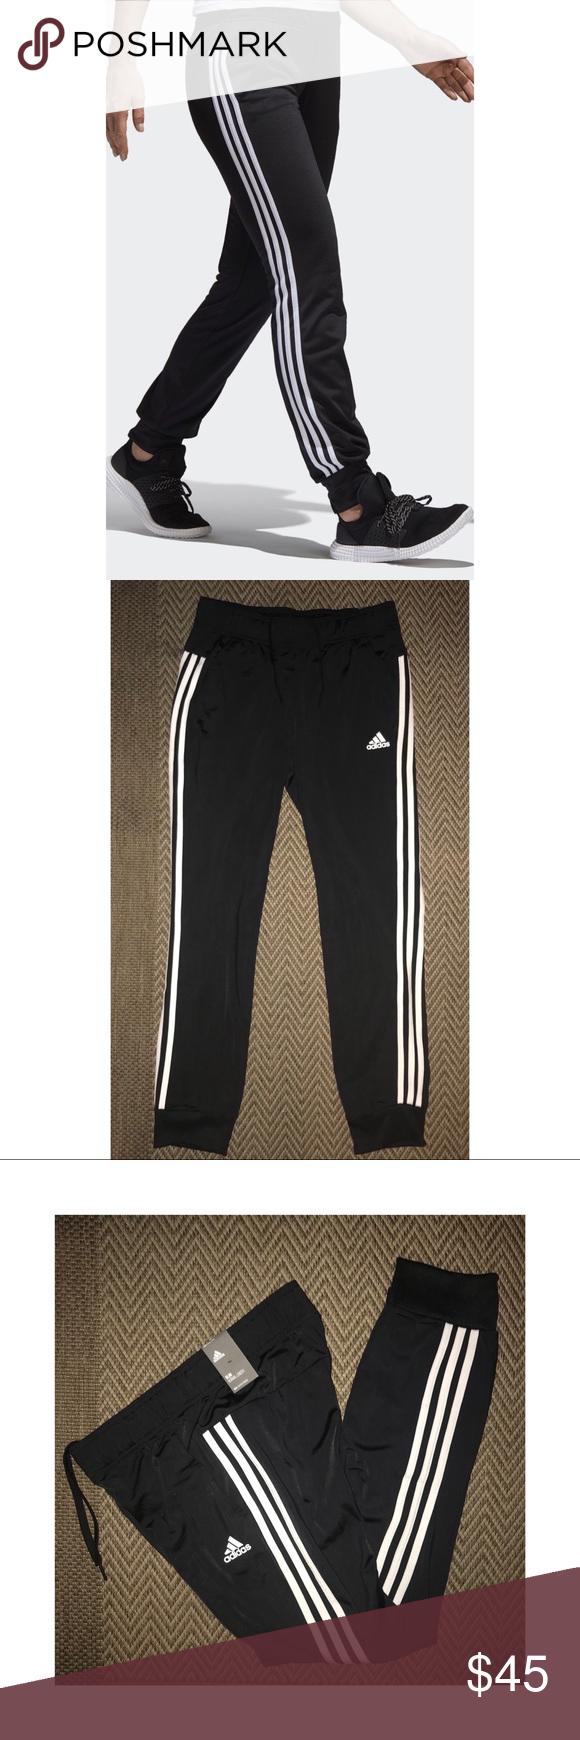 707e0a53c5244 Adidas Women Designed-2-Move Cuff Pant Blk Wht Gym DESIGNED 2 MOVE ...